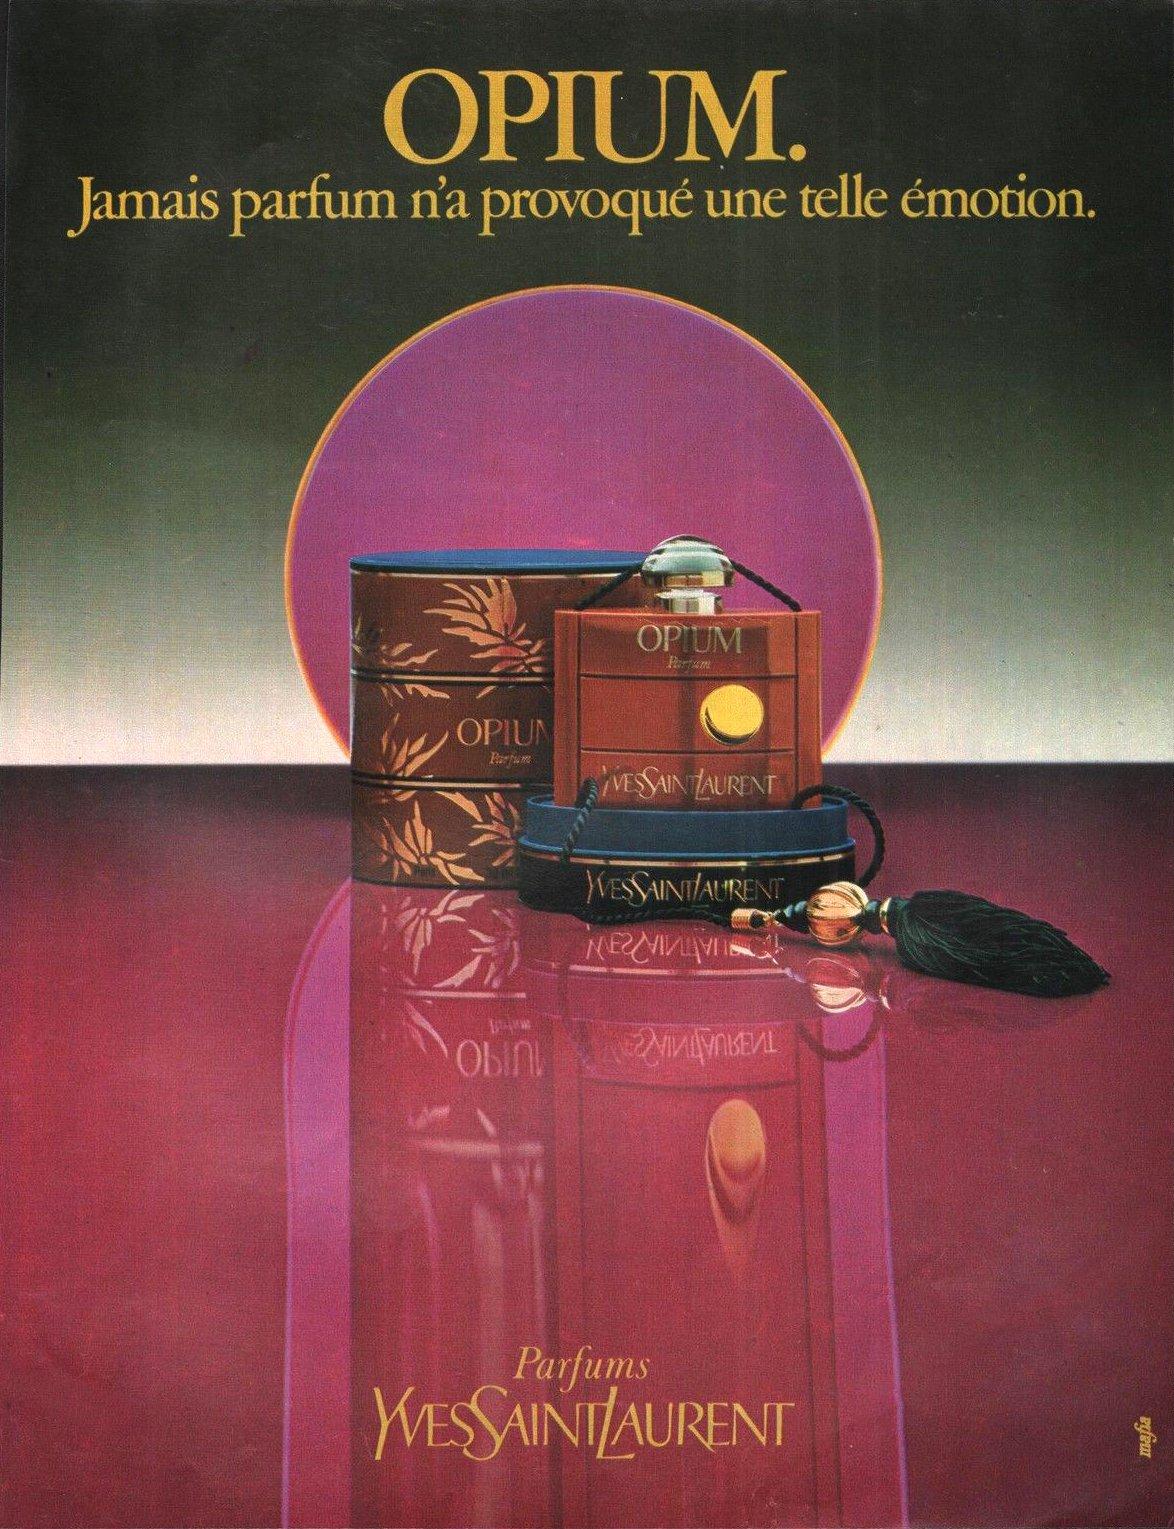 Yves saint laurent opium perfume - 3 3